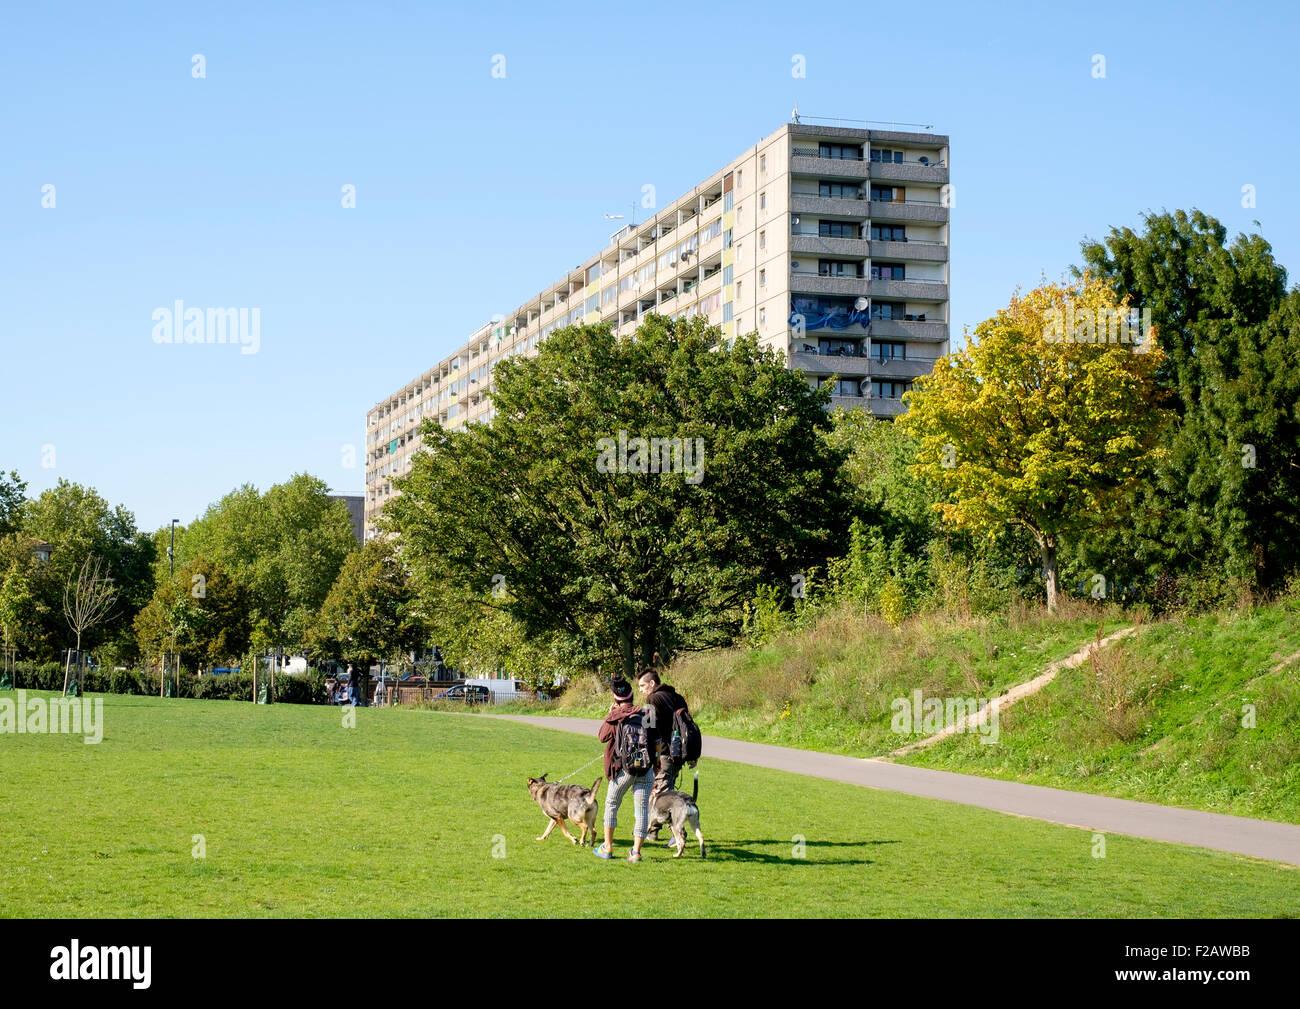 Walworth, London - 10 Sept 2015: In Burgess Park, South London, looking towards  Southwark's Aylesbury Estate - Stock Image